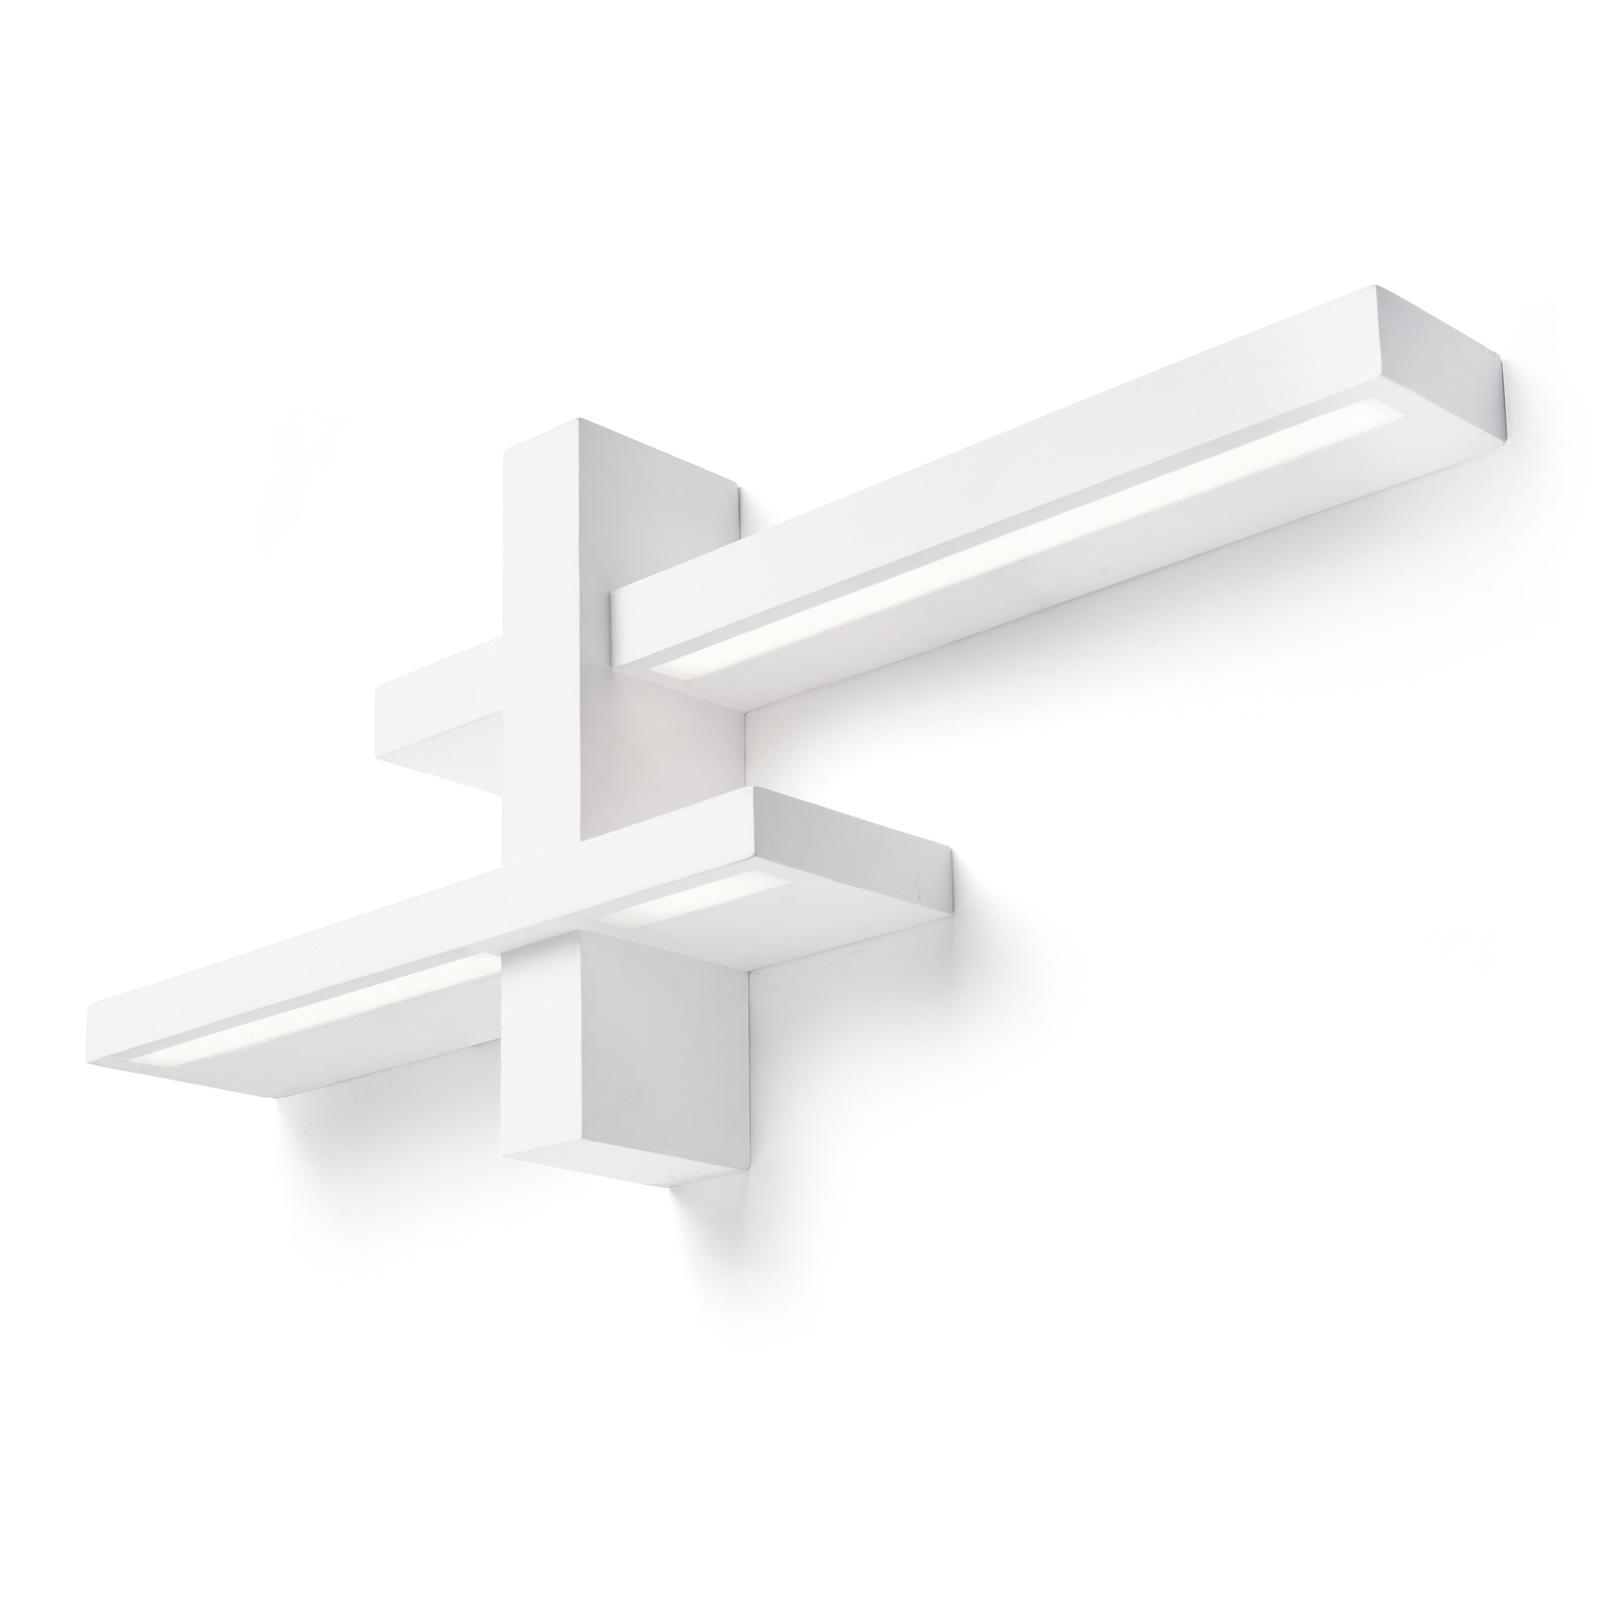 LED-vegglampe Magnesia T286 60 x 27 cm